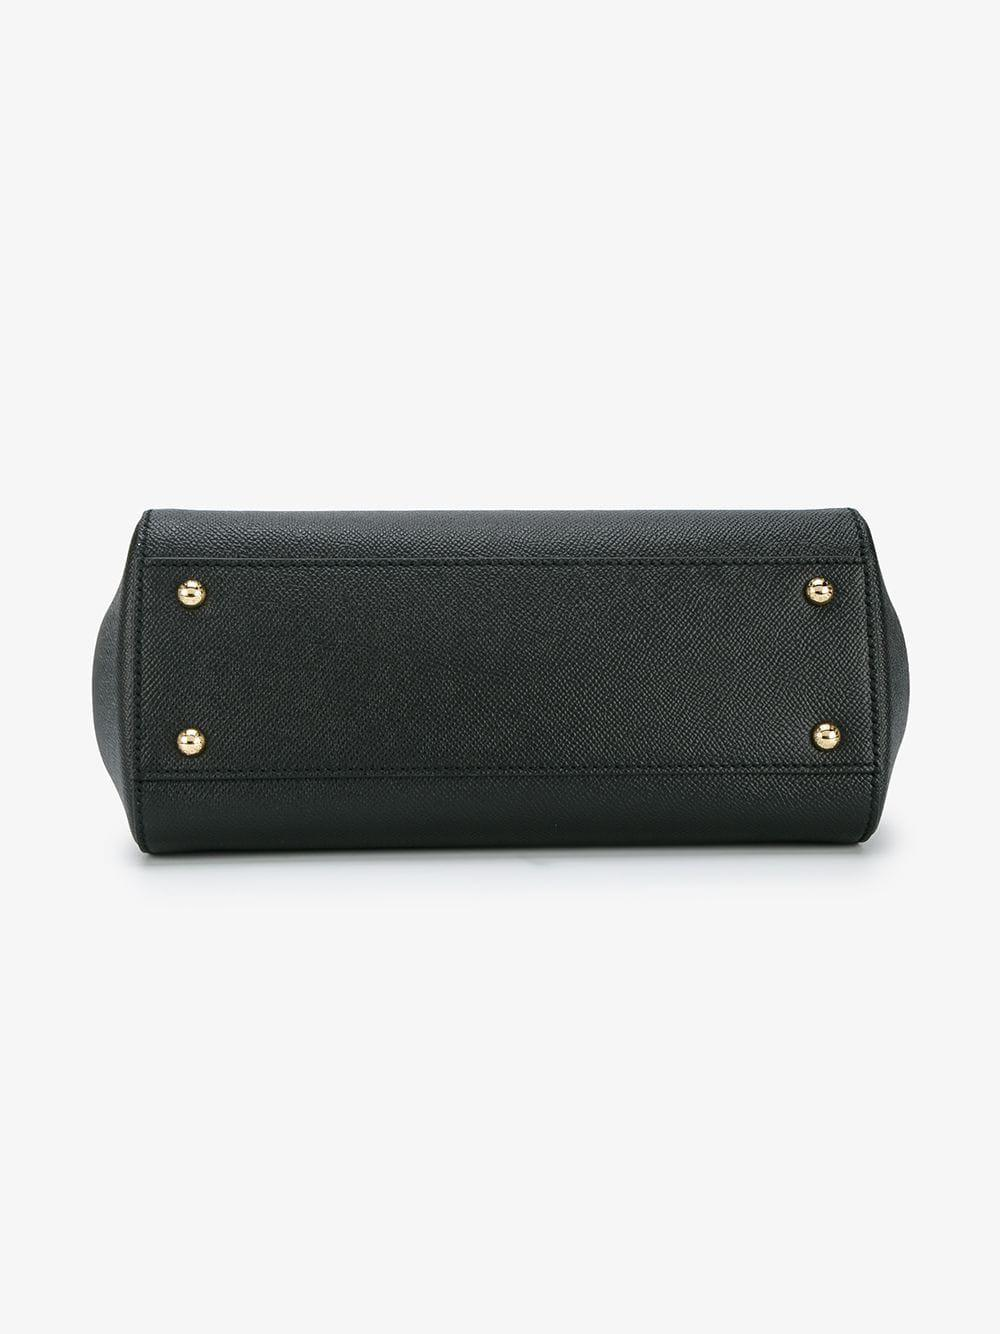 Dolce   Gabbana - Black Miss Sicily Leather Handbag - Lyst. View fullscreen 0faf065cc60